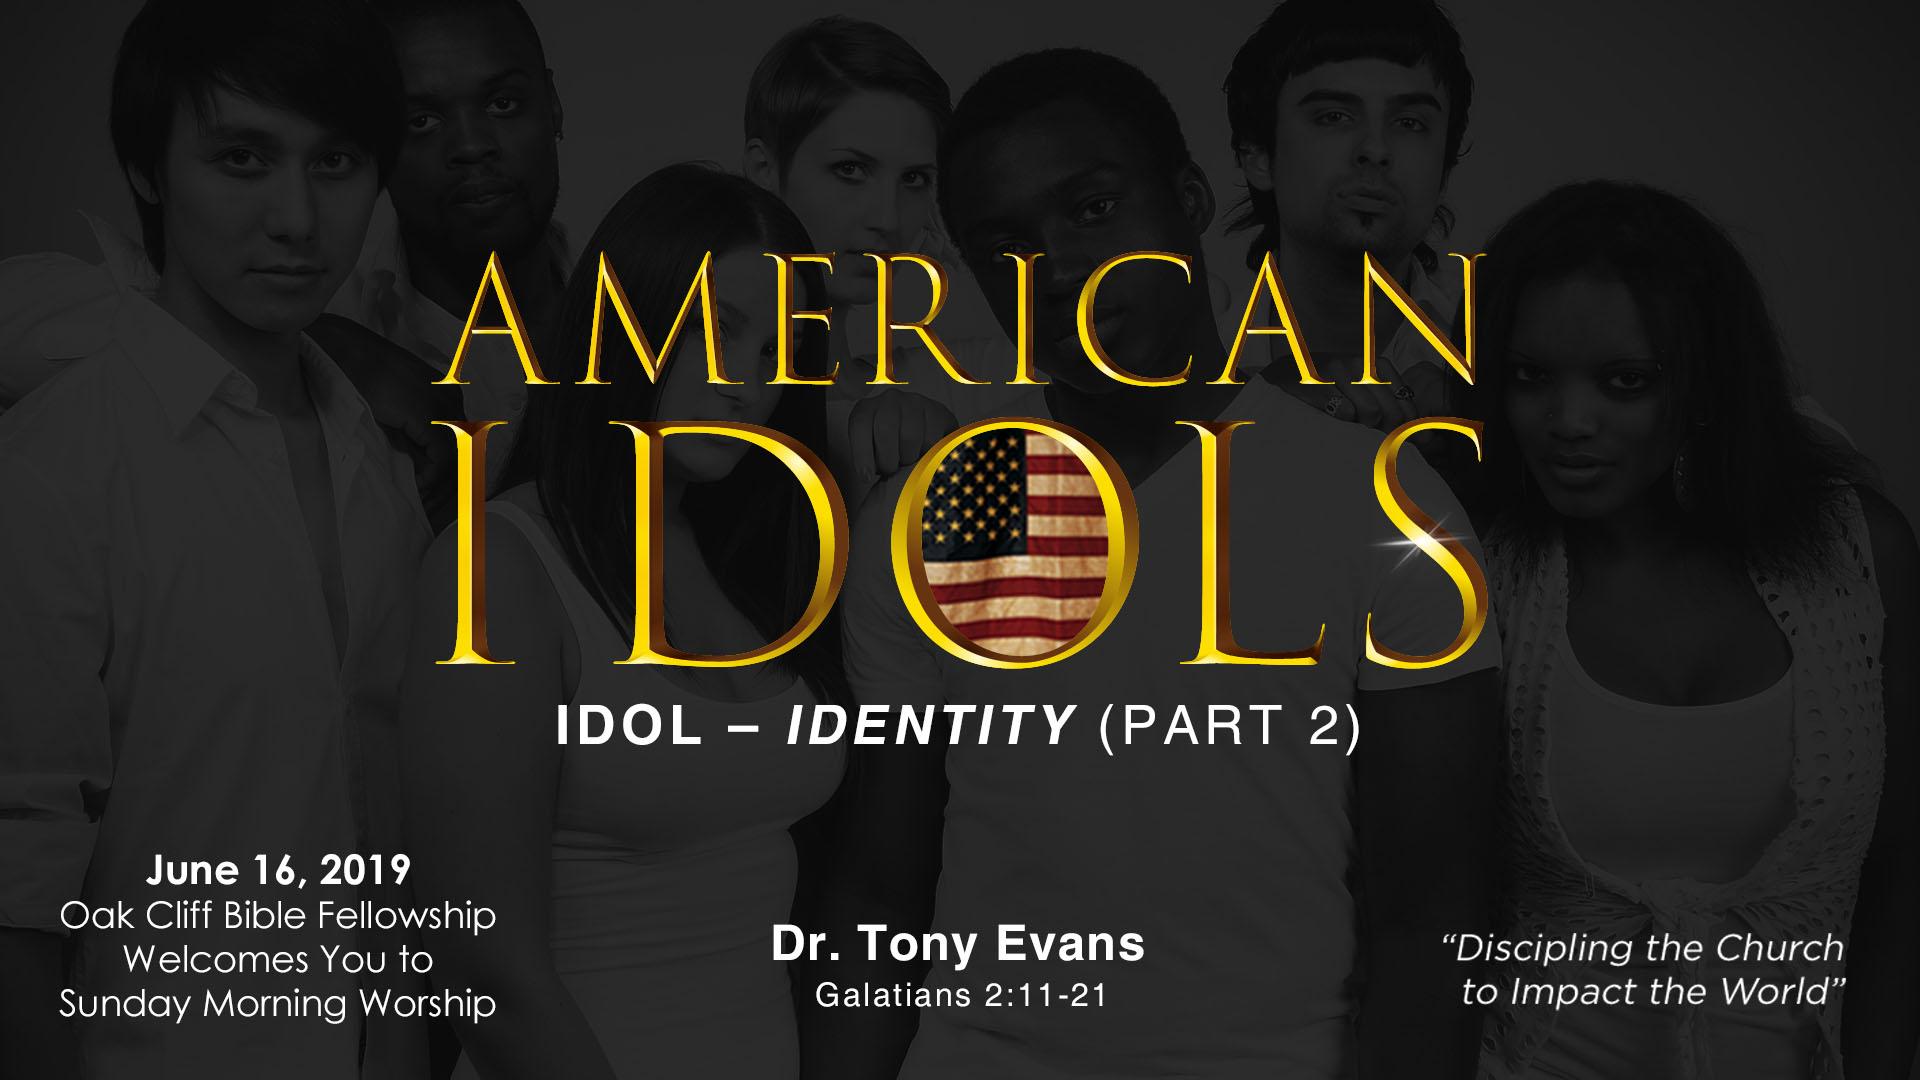 American Idols: Identity by Dr. Tony Evans